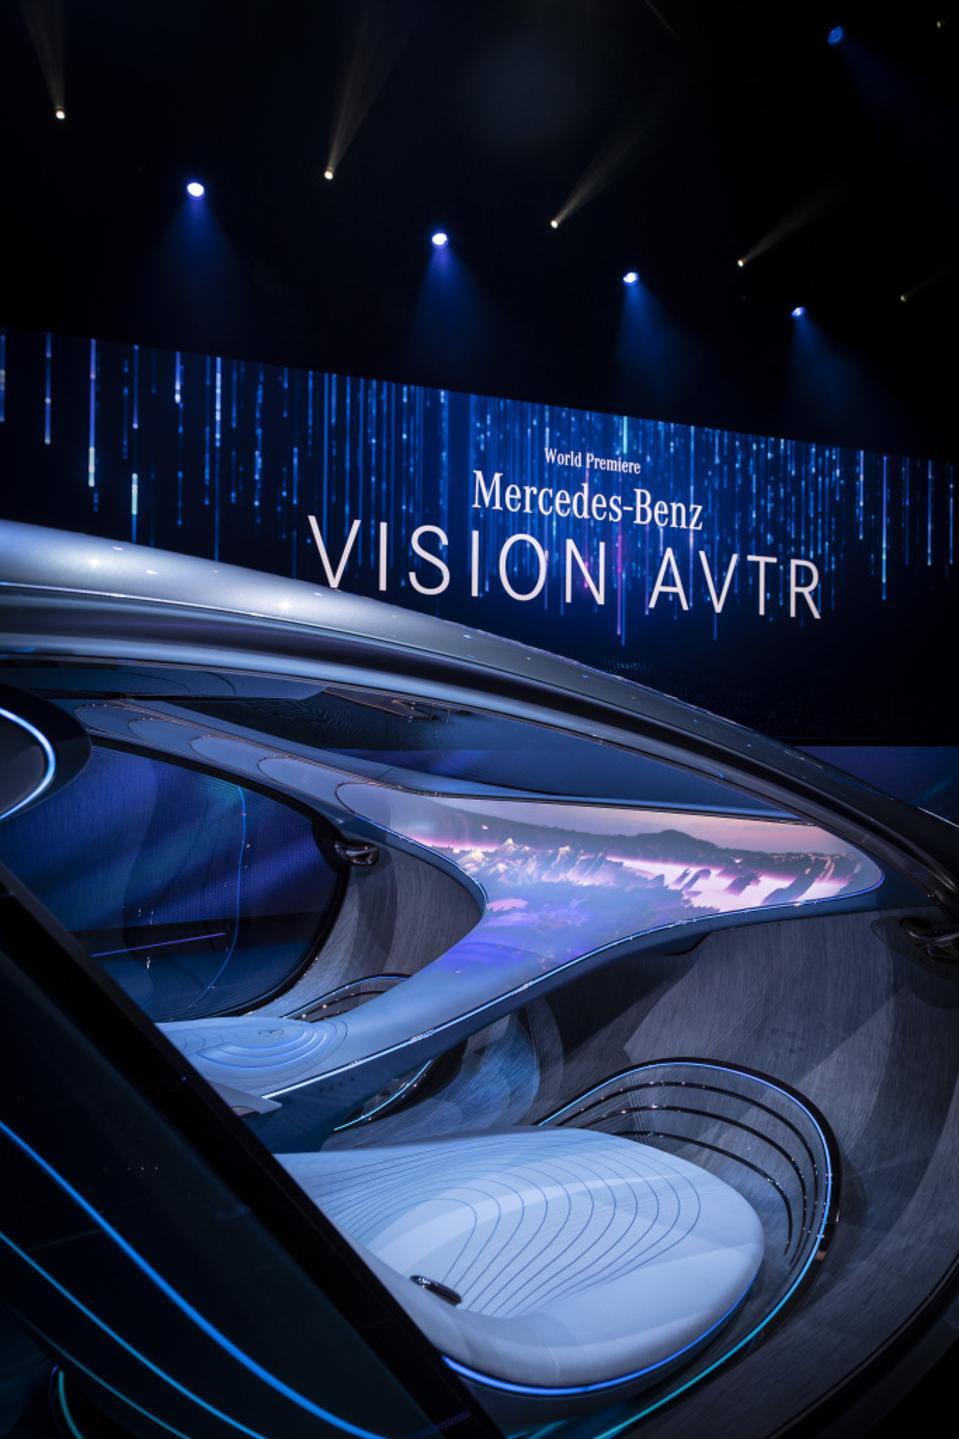 Mercedes-Benz AVTR at CES 2020